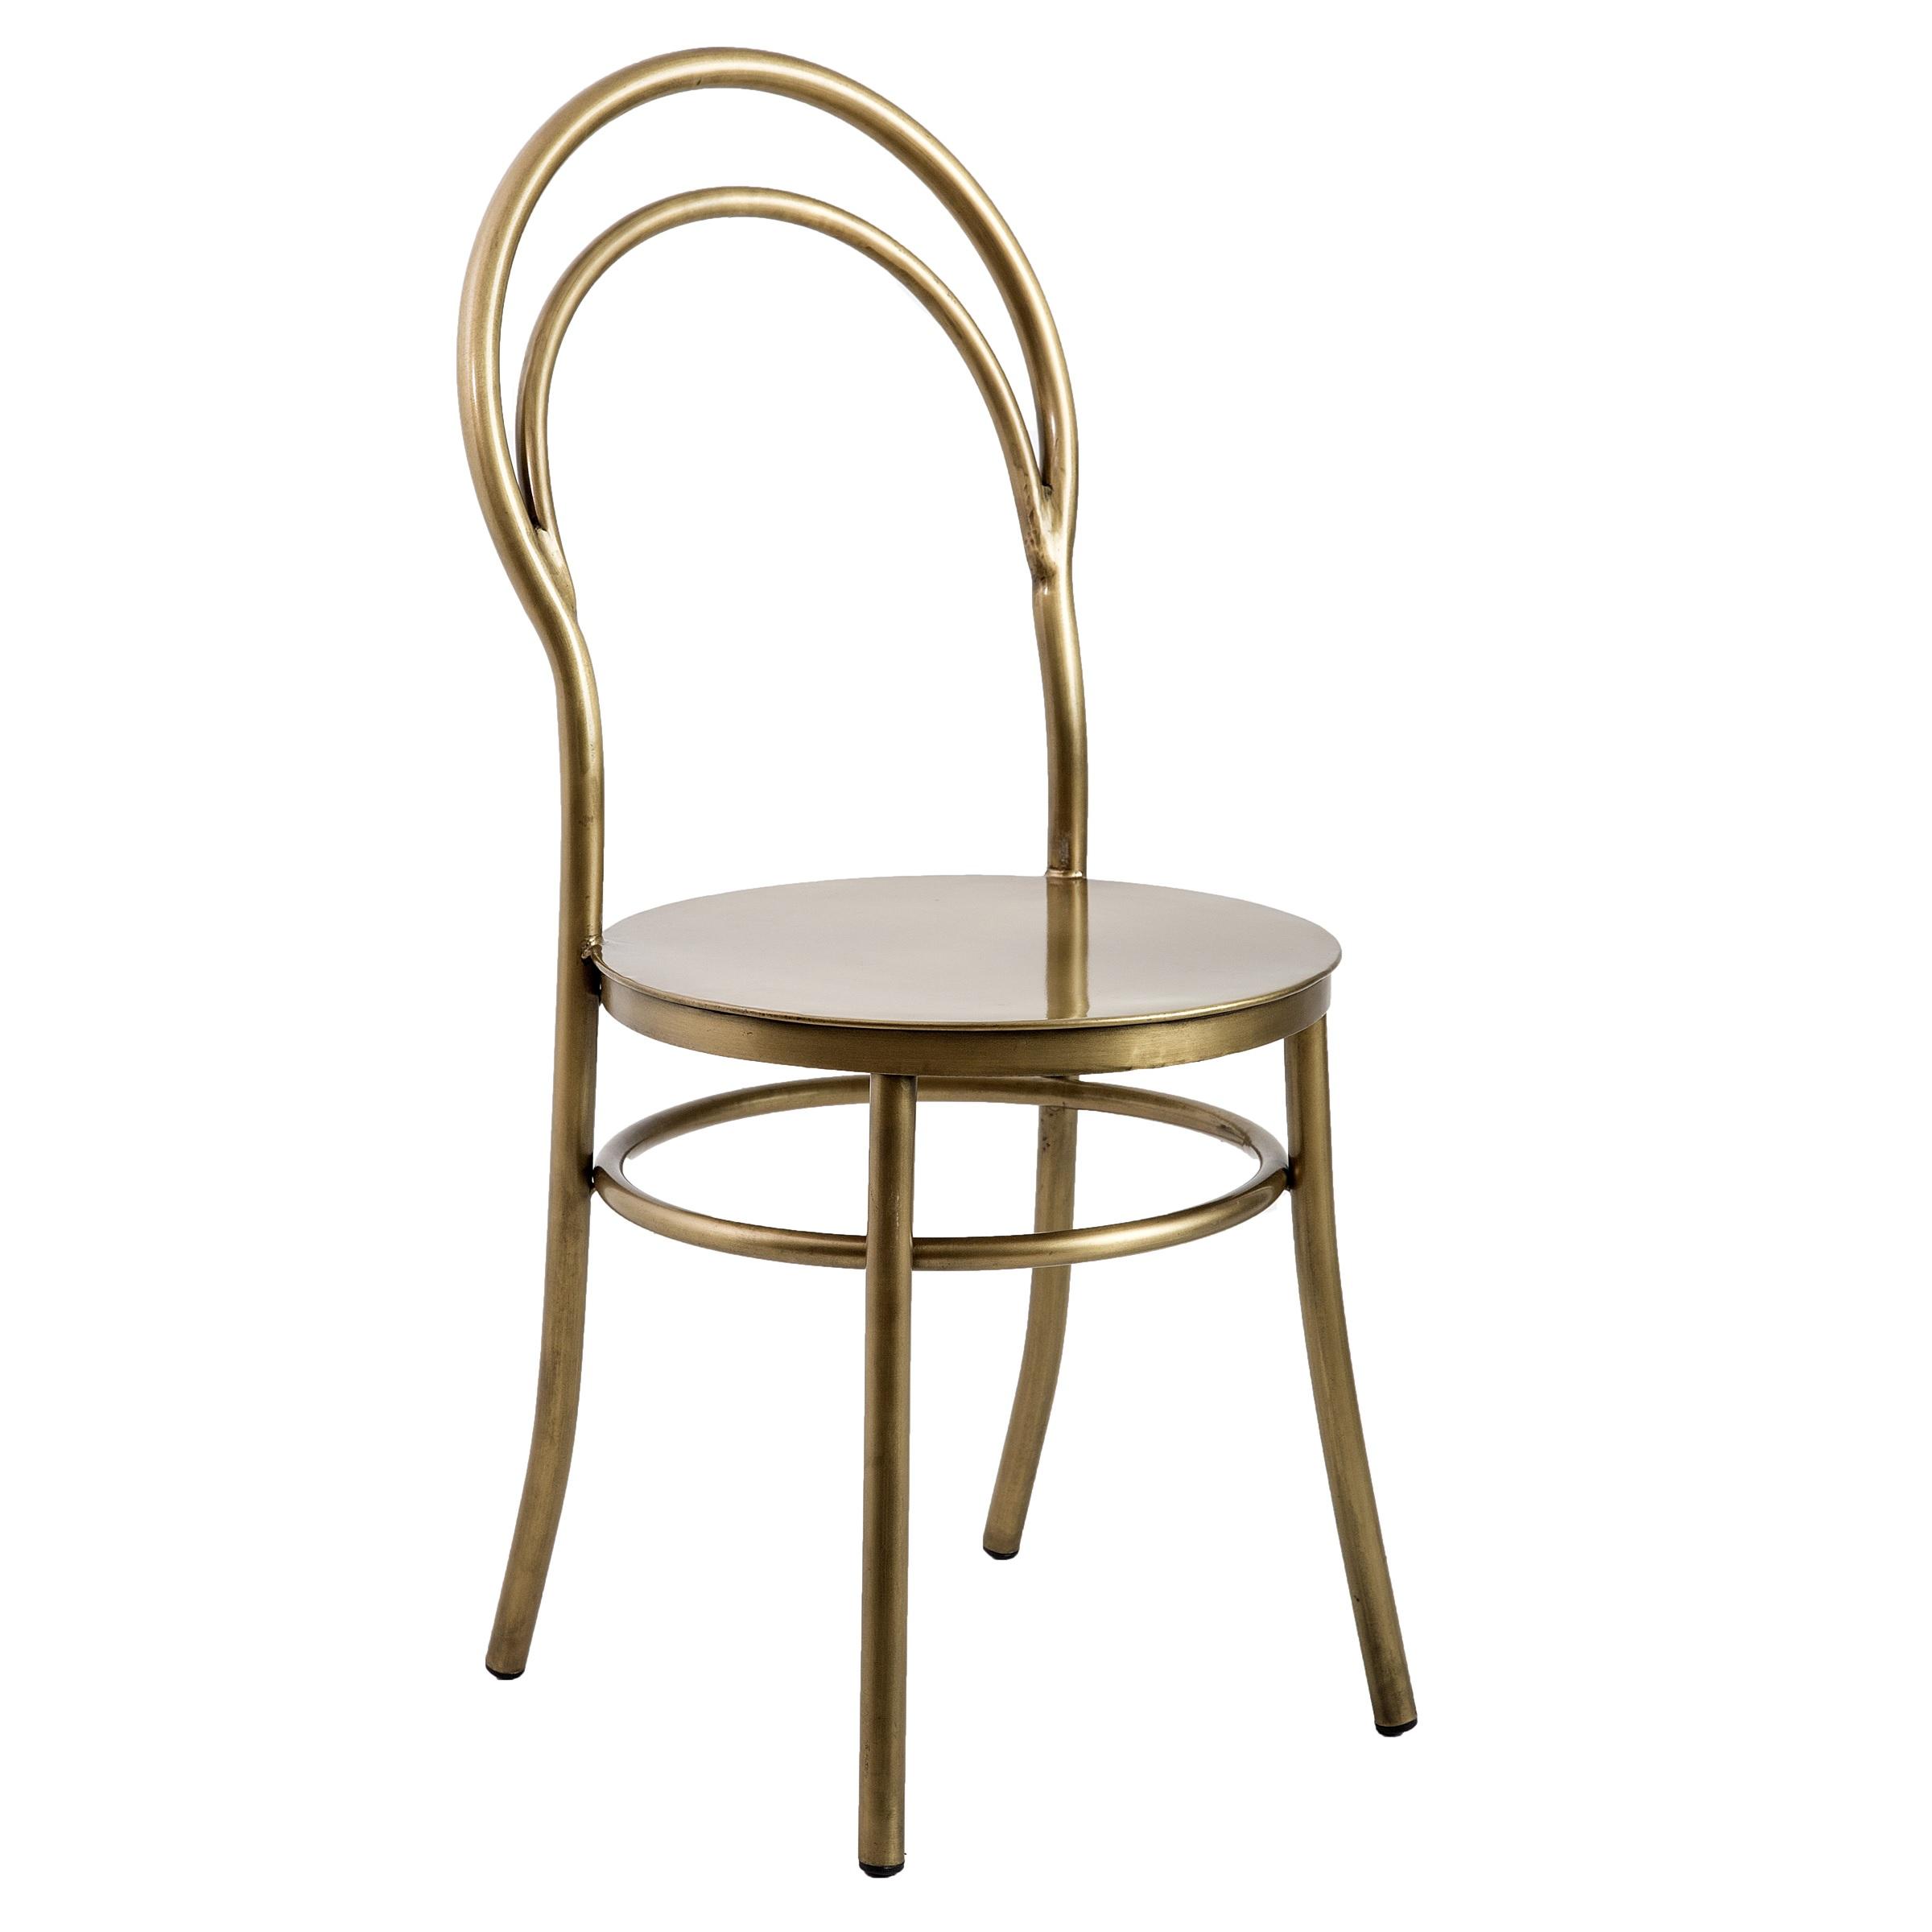 by thonet pin chairs anton lorenz pinterest armchairs brass chair